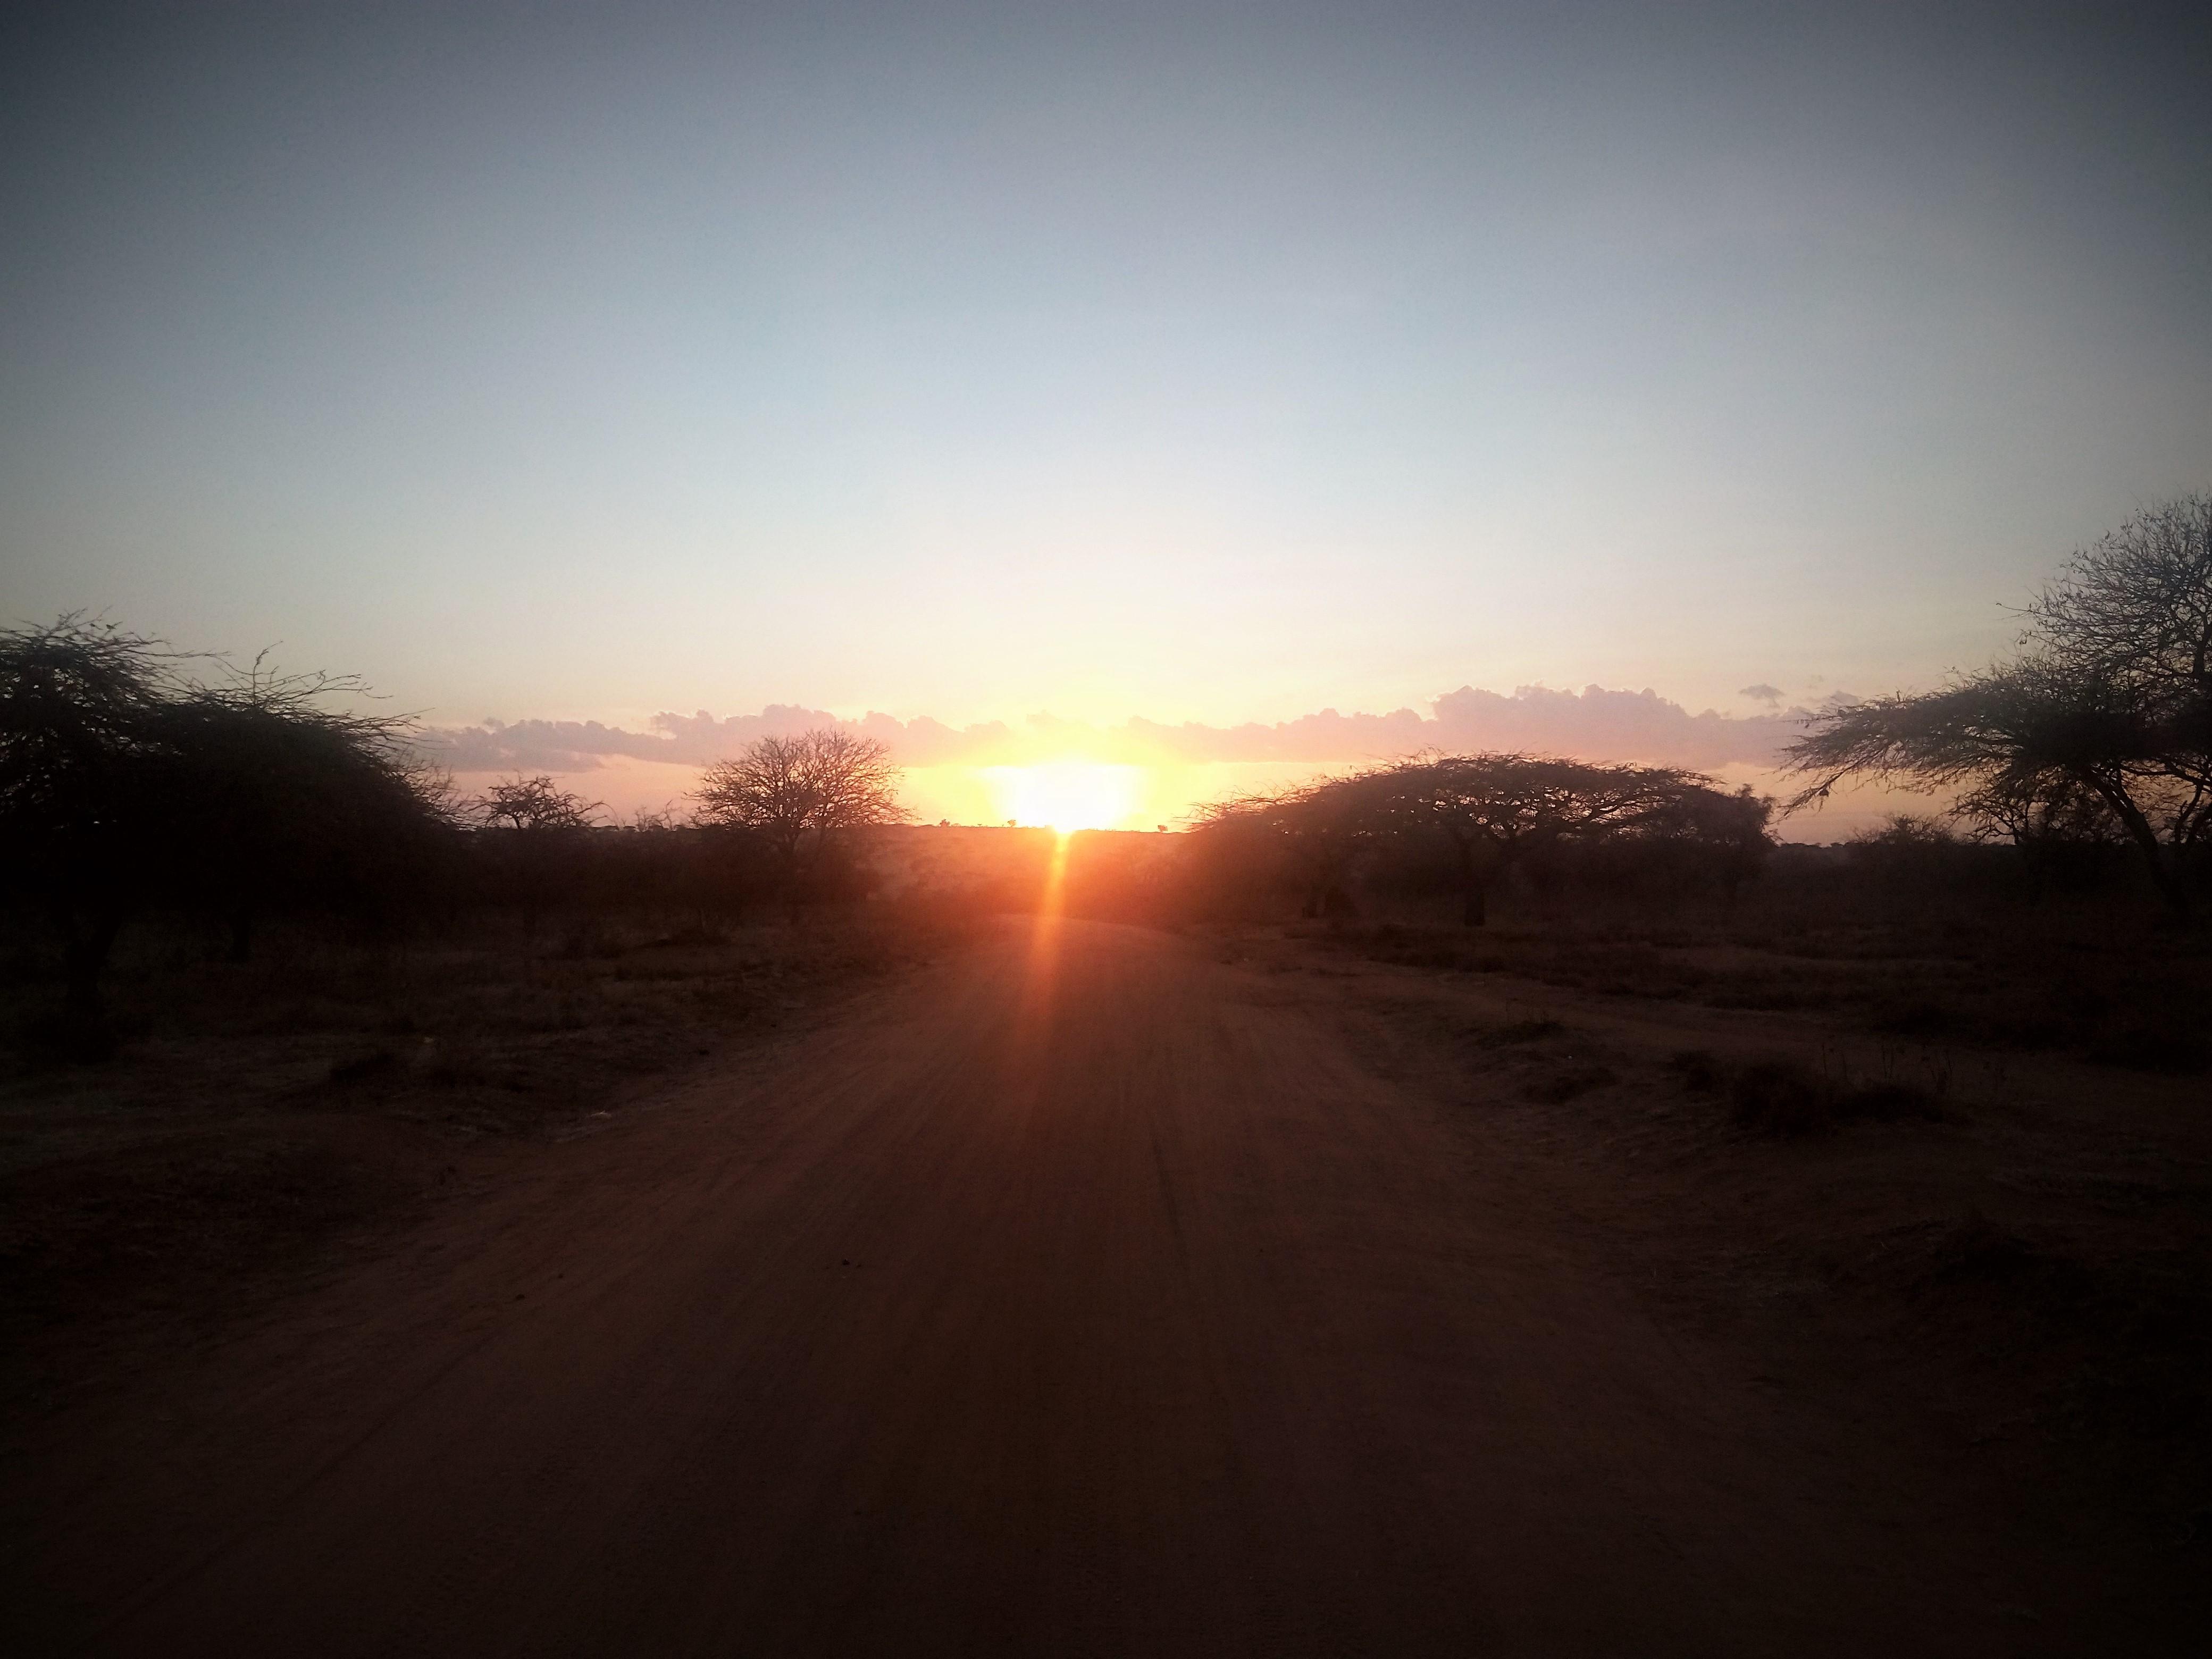 Sunset somewhere in Kajiado